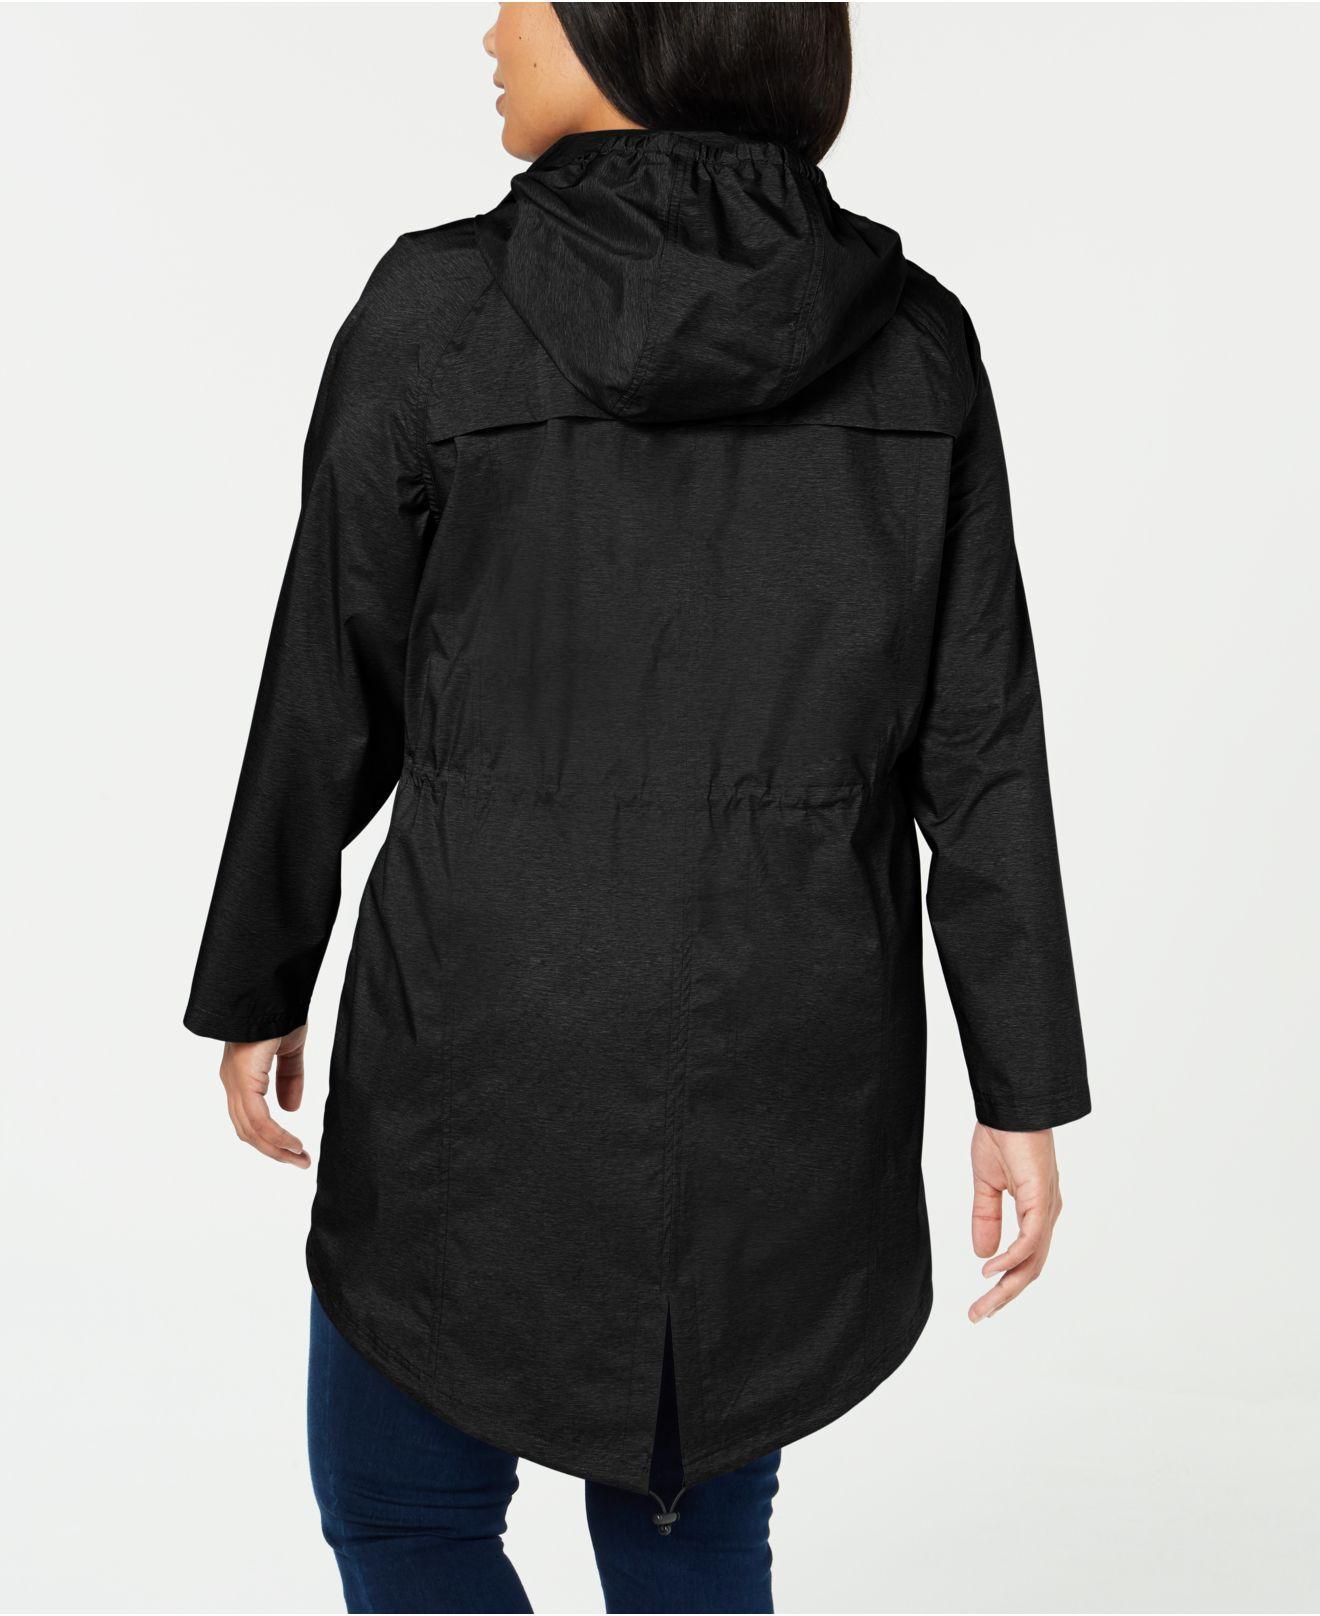 bdfef0bb4aa8a Lyst - 32 Degrees Plus Size Hooded Waterproof Anorak Raincoat in Black